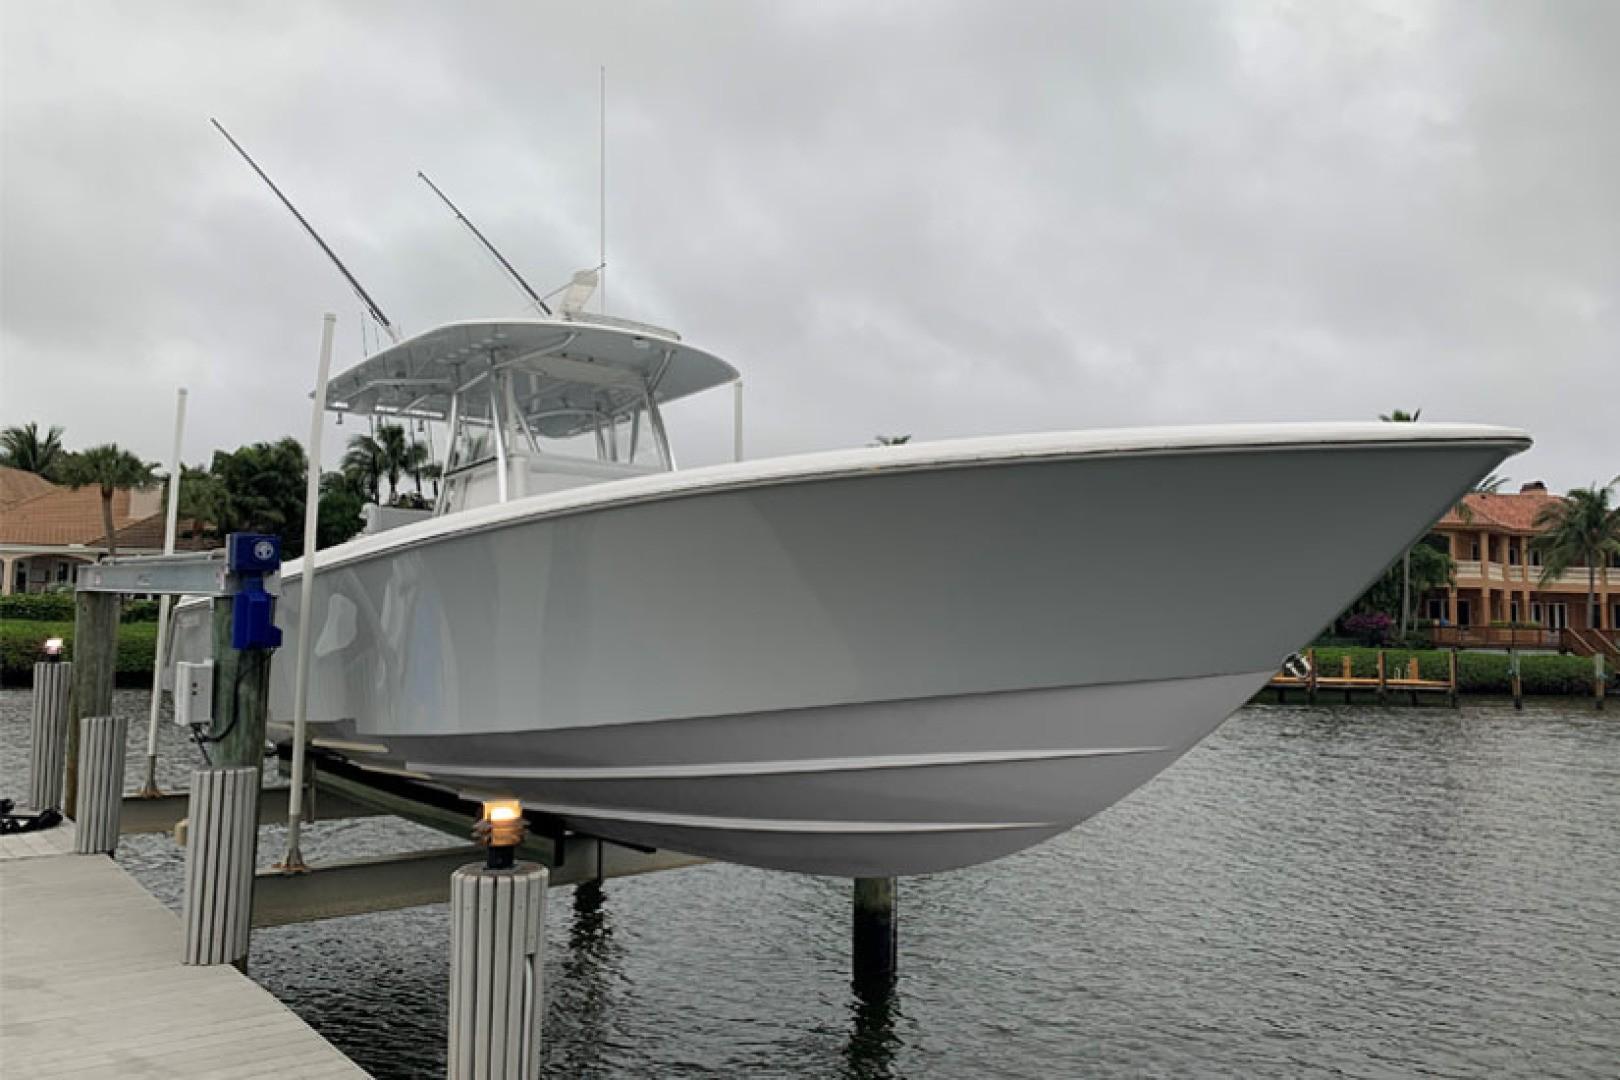 2017 Contender 39 ST